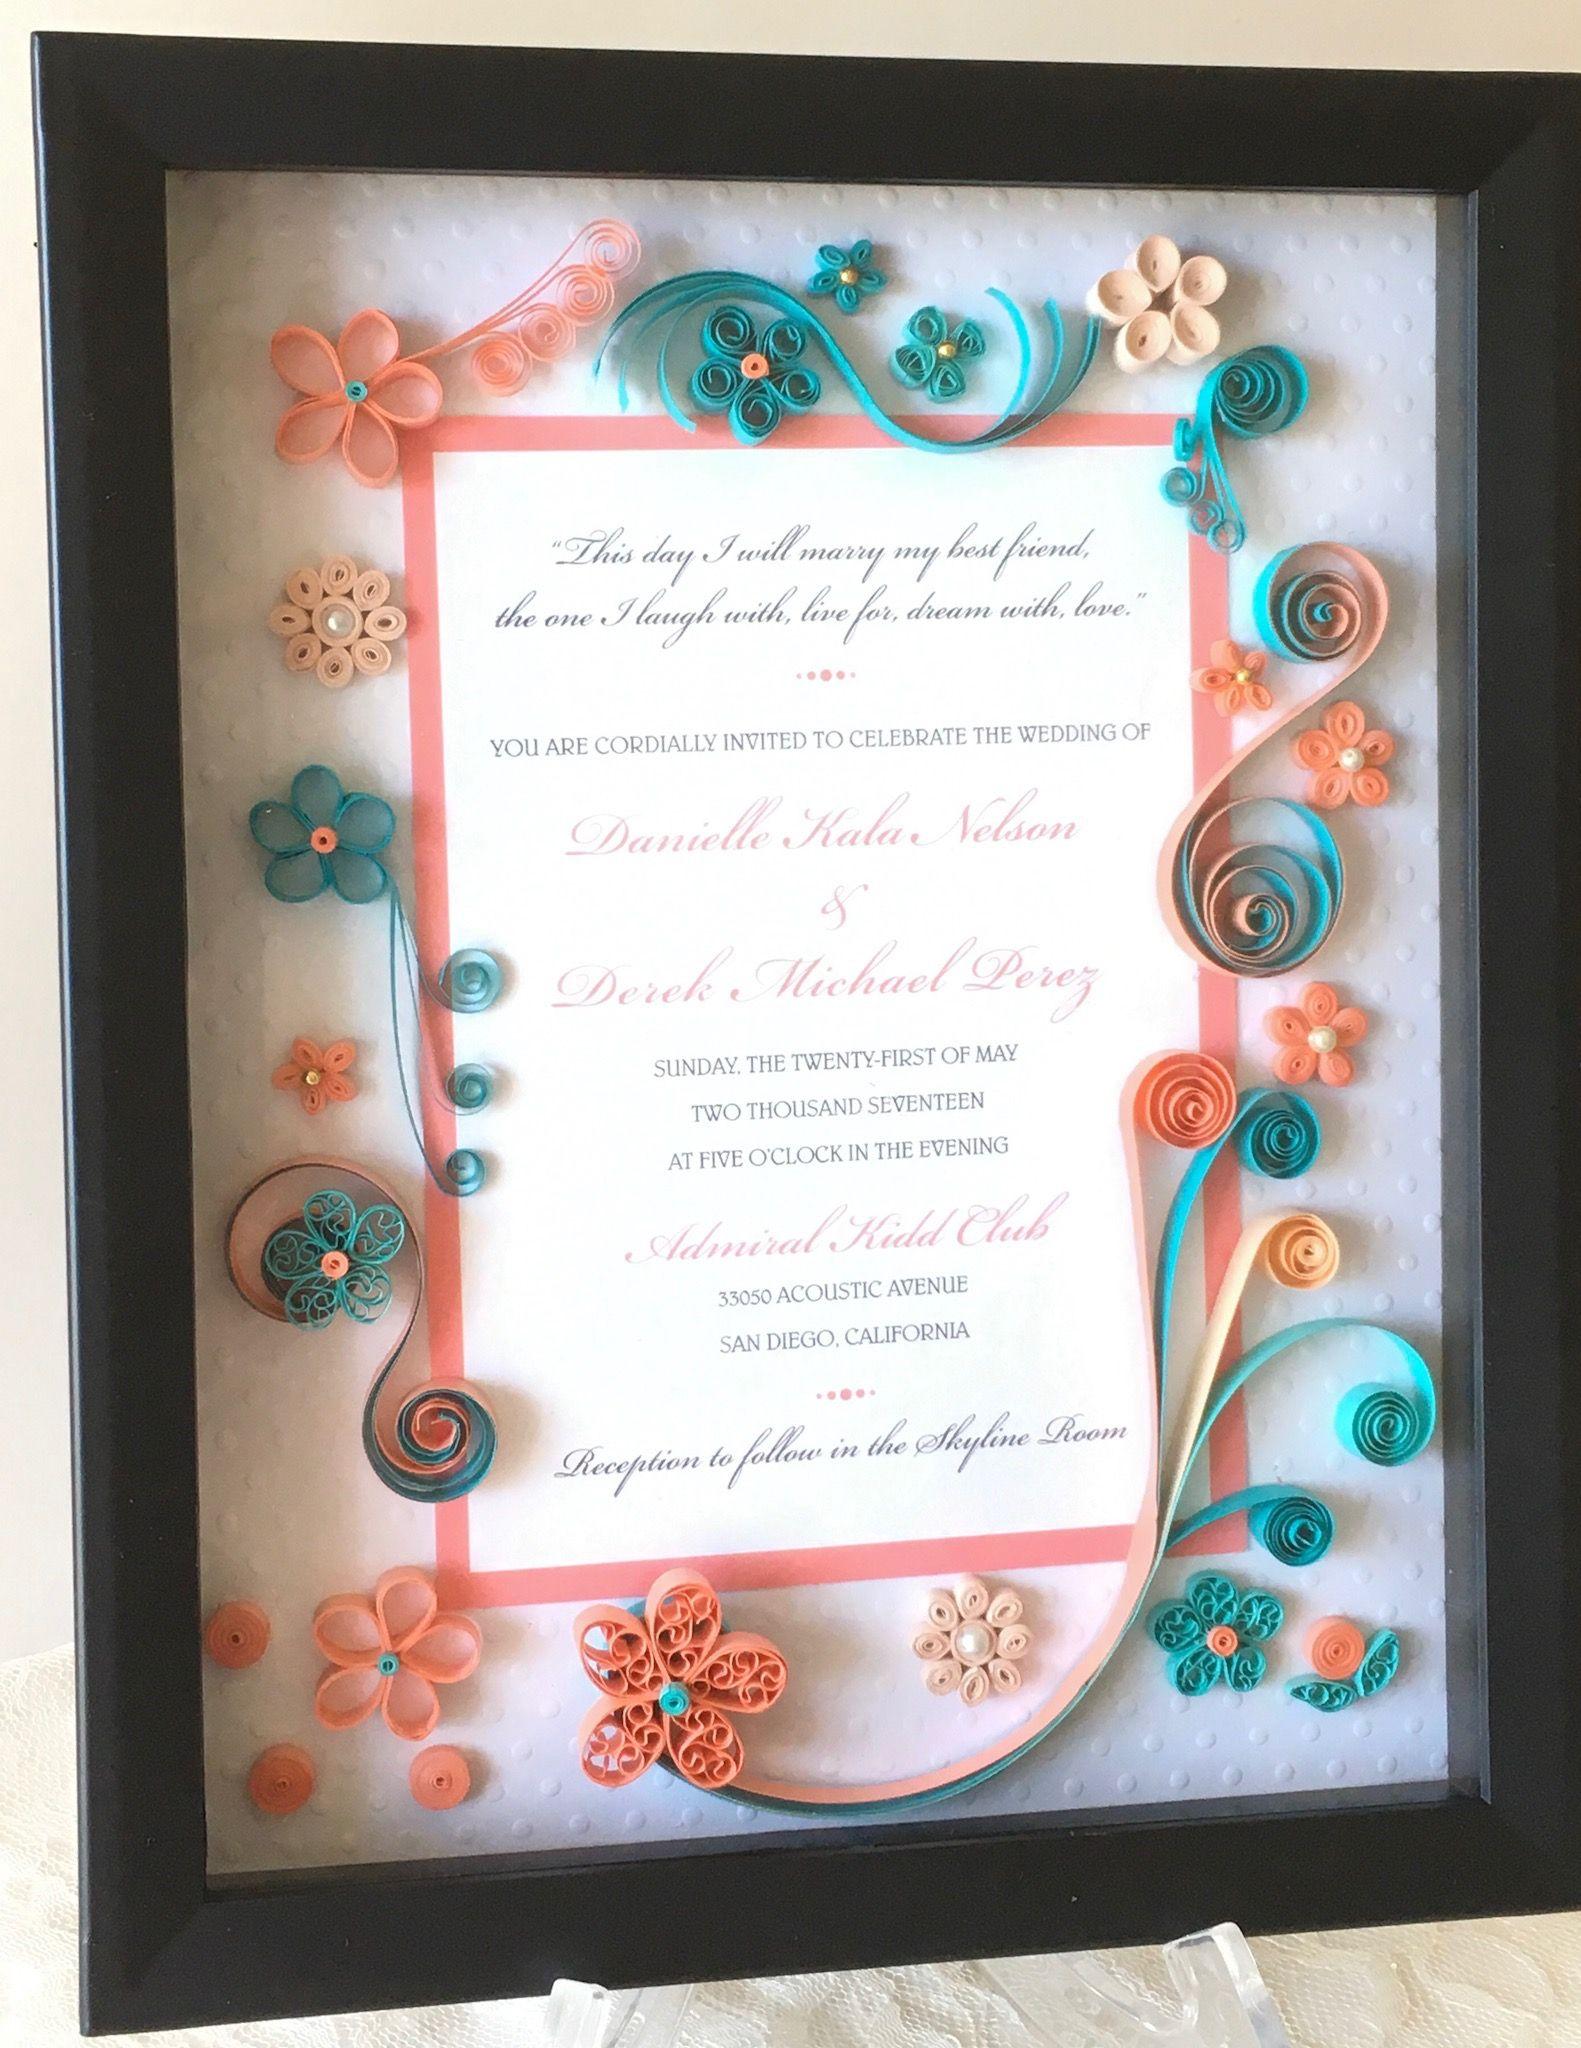 Personalized wedding invitation gift keepsake will last a lifetime ...